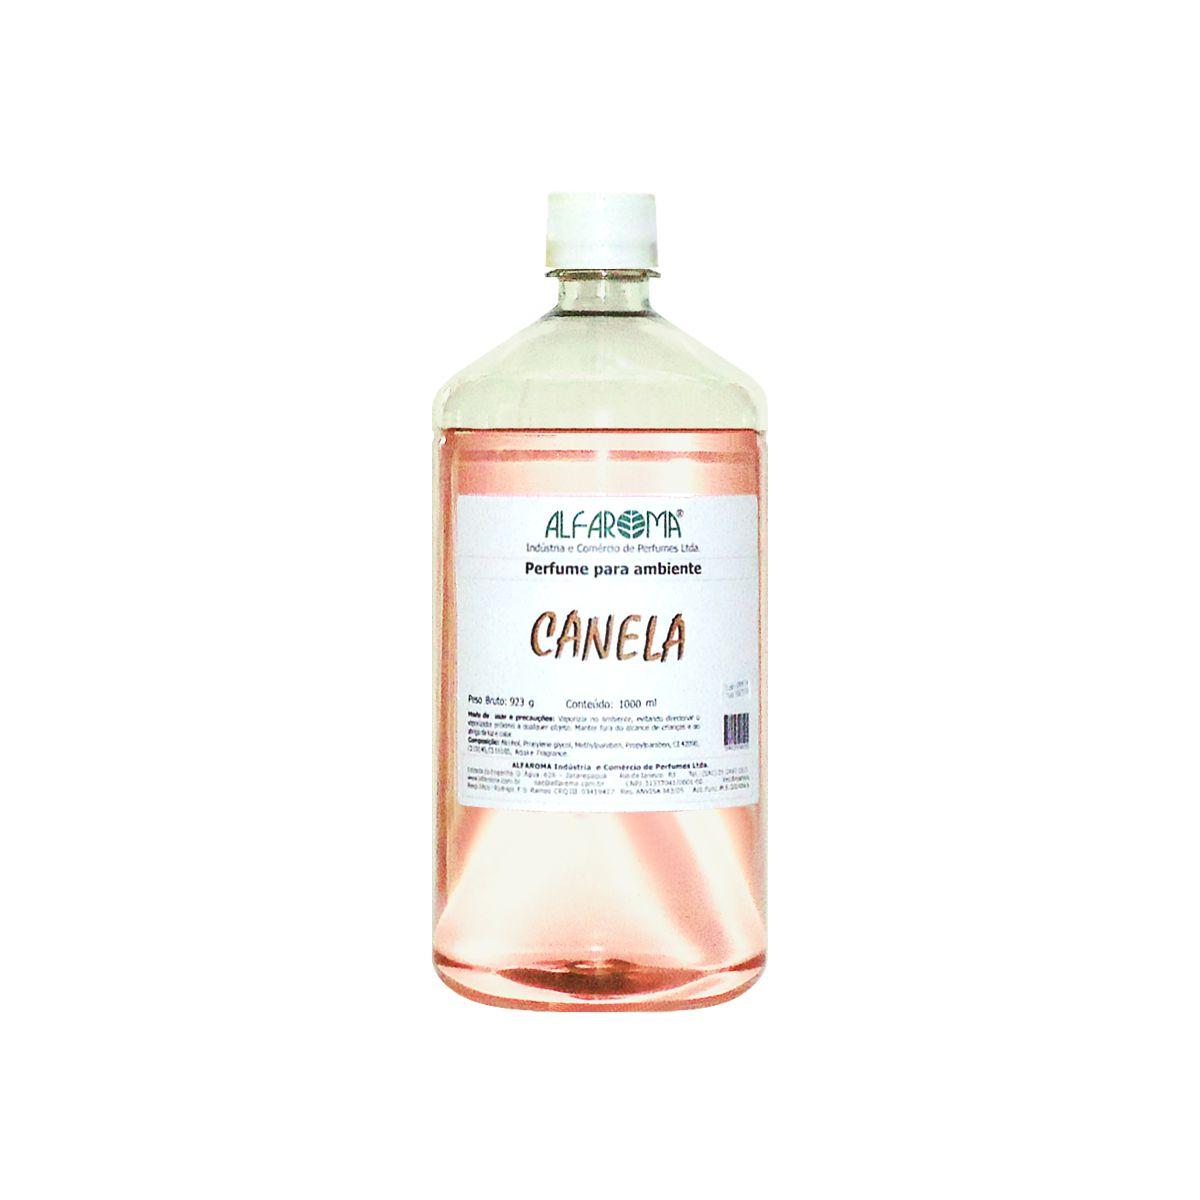 Perfume para Ambiente Canela - Alfaroma